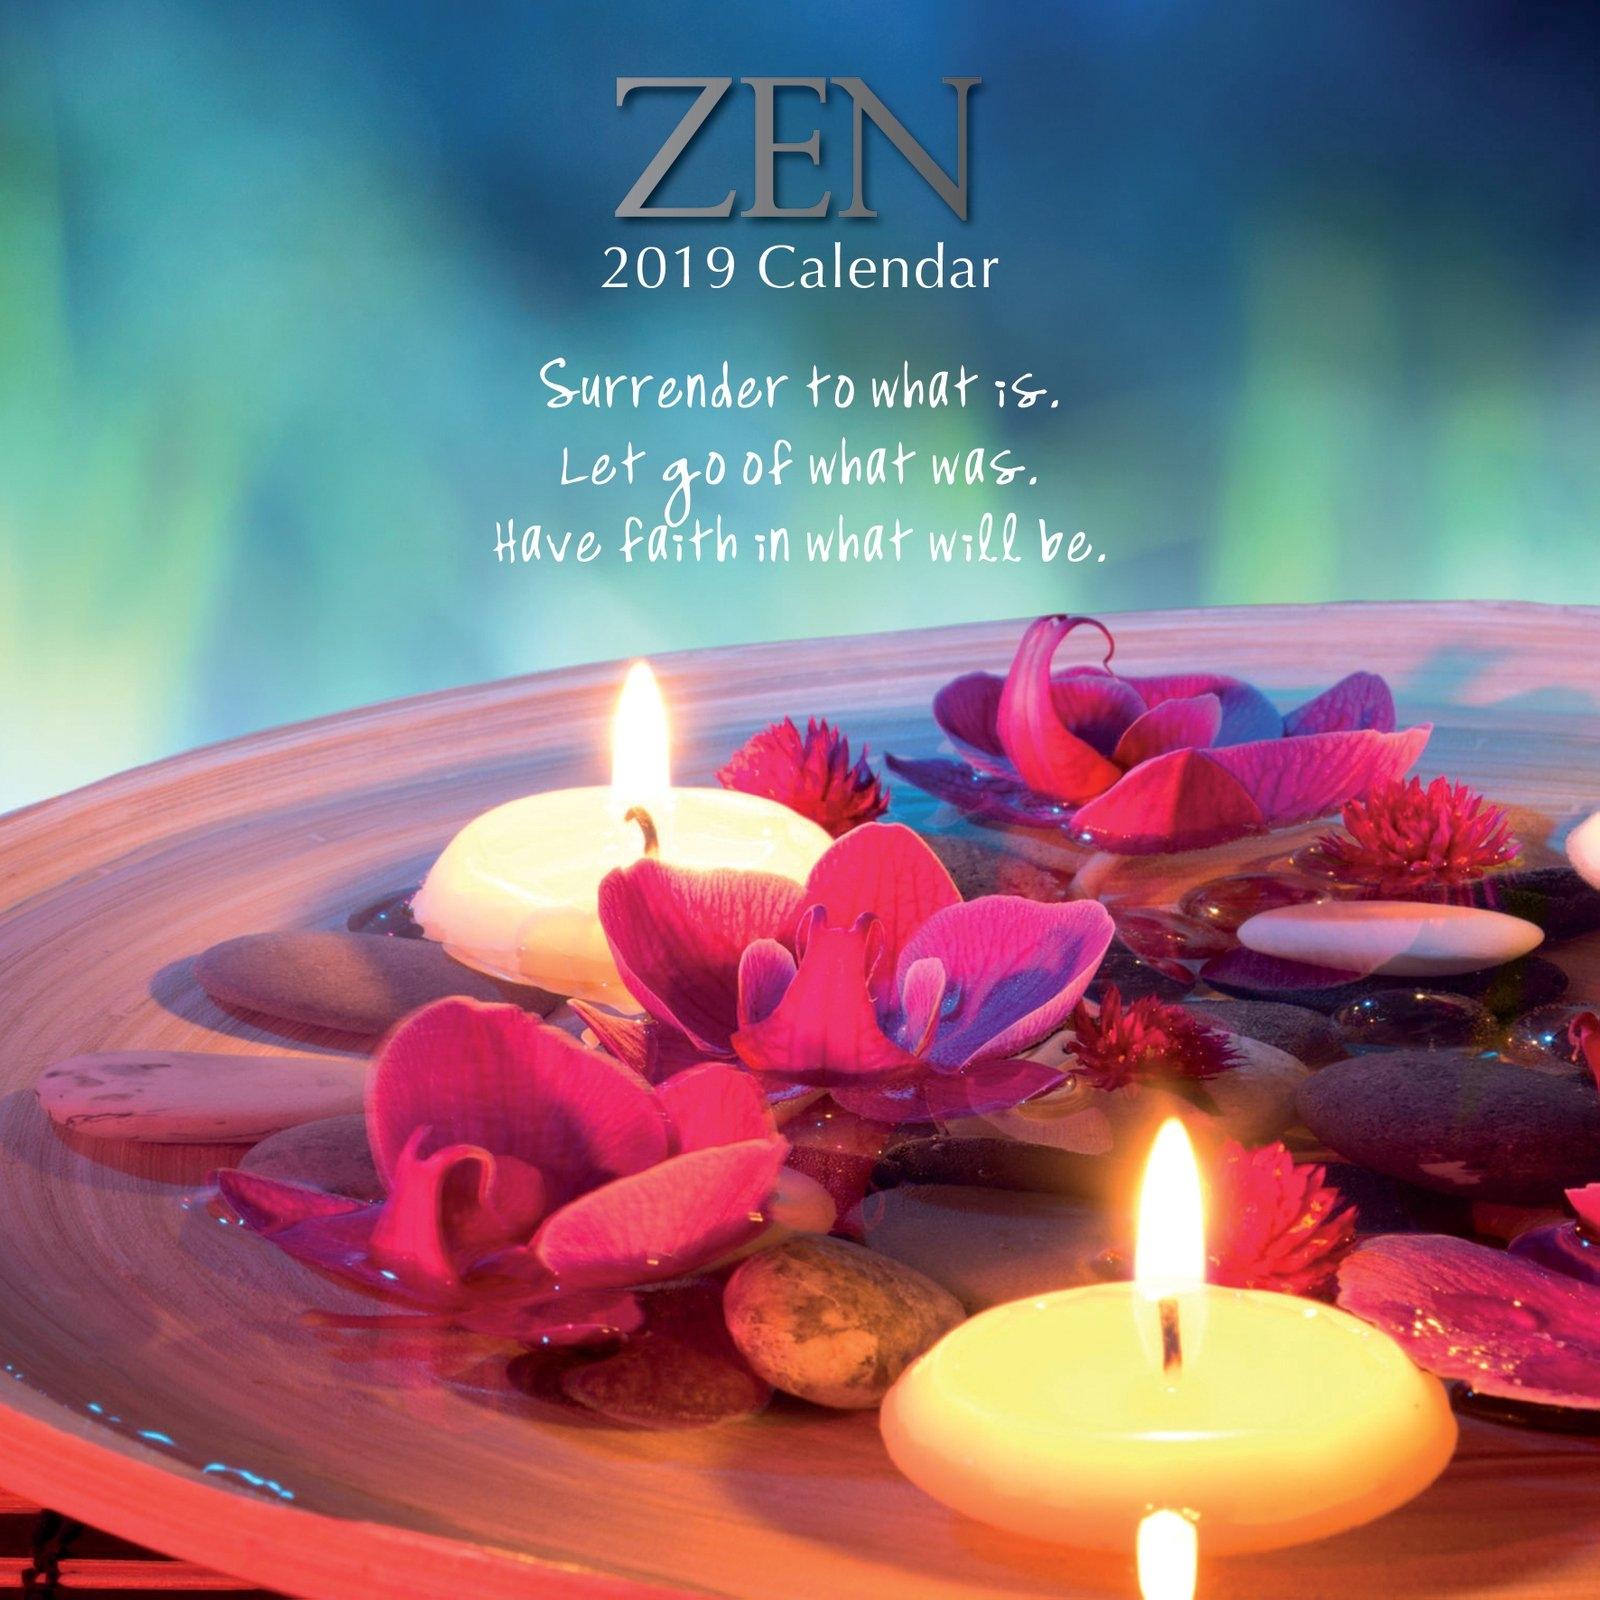 Zen - 2019 Wall Calendar 16 Month Premium Square 30X30Cm (N 2019 Calendar Zen